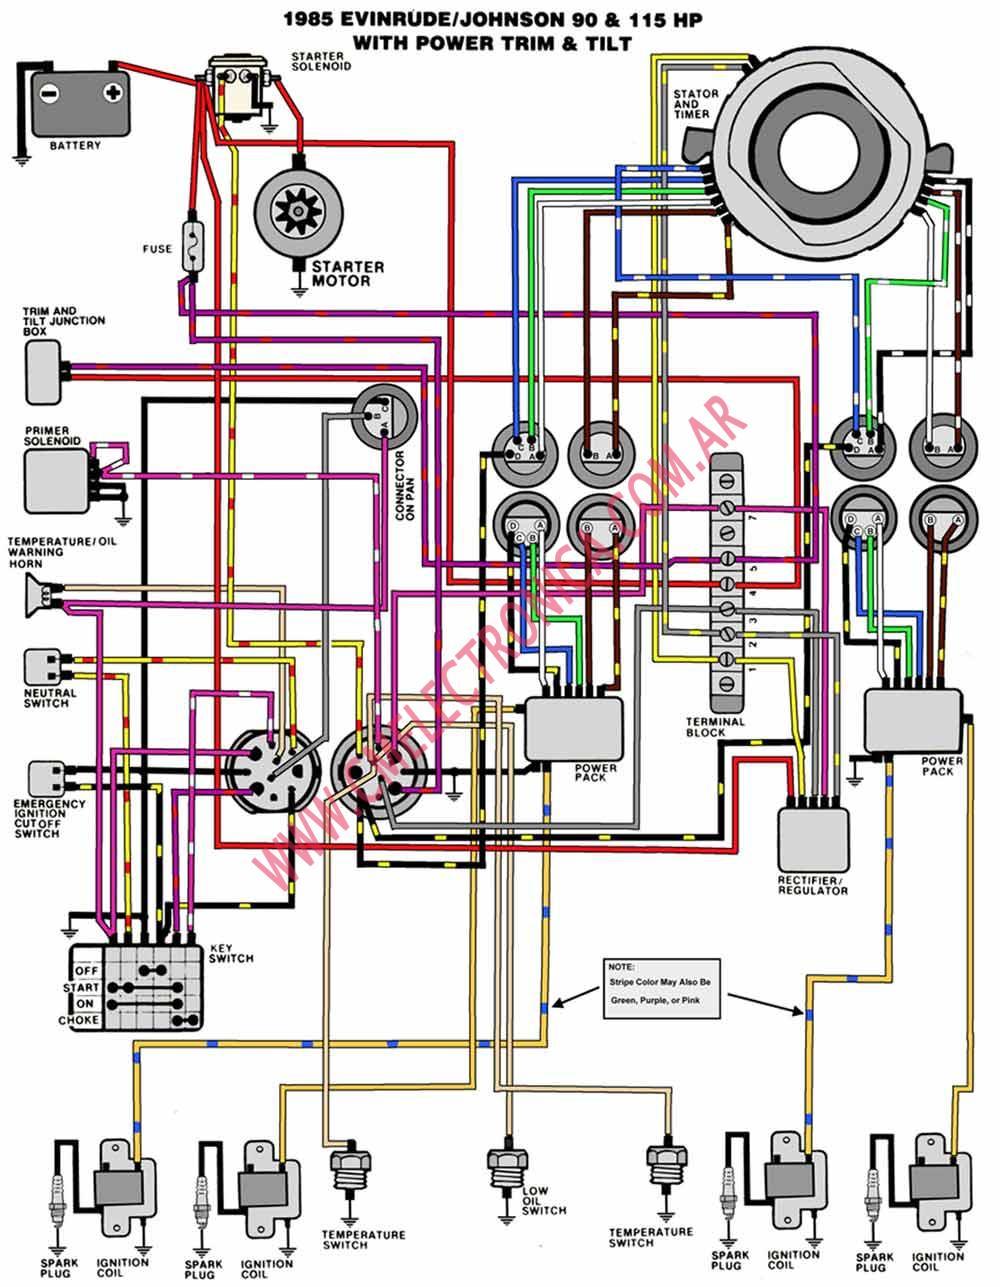 suzuki df 115 wiring diagram ka24e engine diagram vw door wiring, Wiring diagram